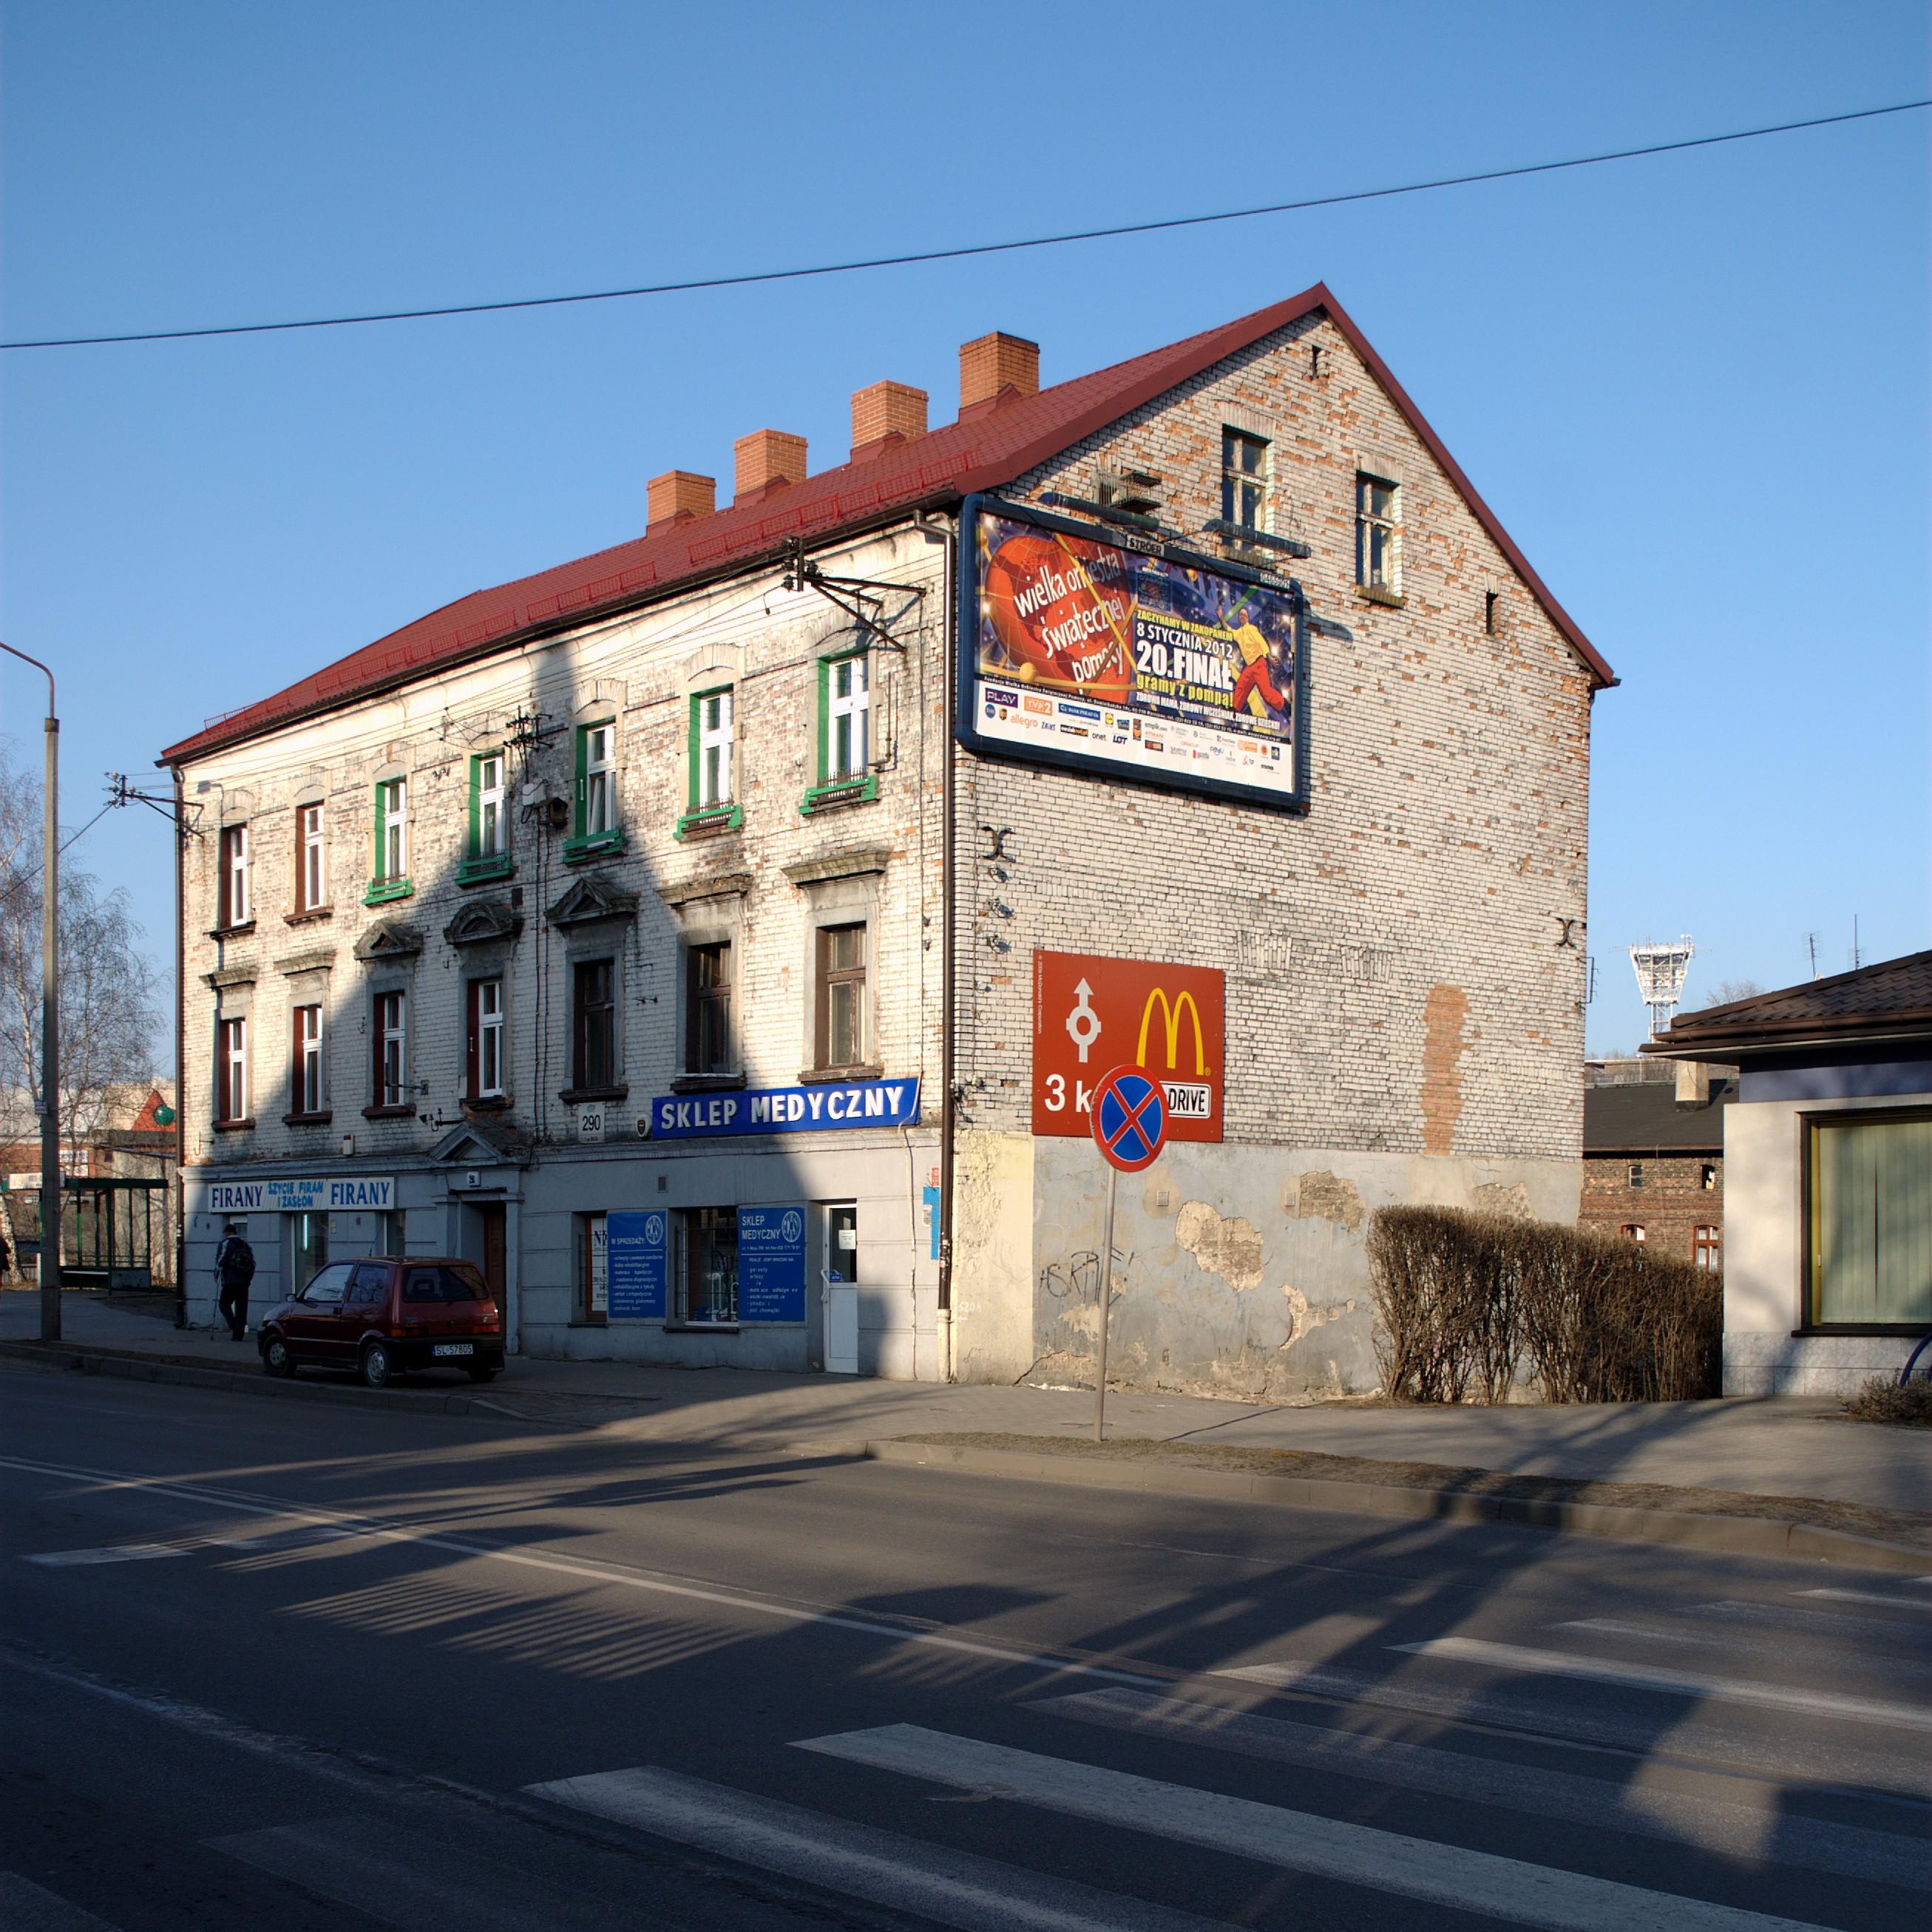 Fileruda śląska 1 Maja 290 Dsc 7261jpg Wikimedia Commons